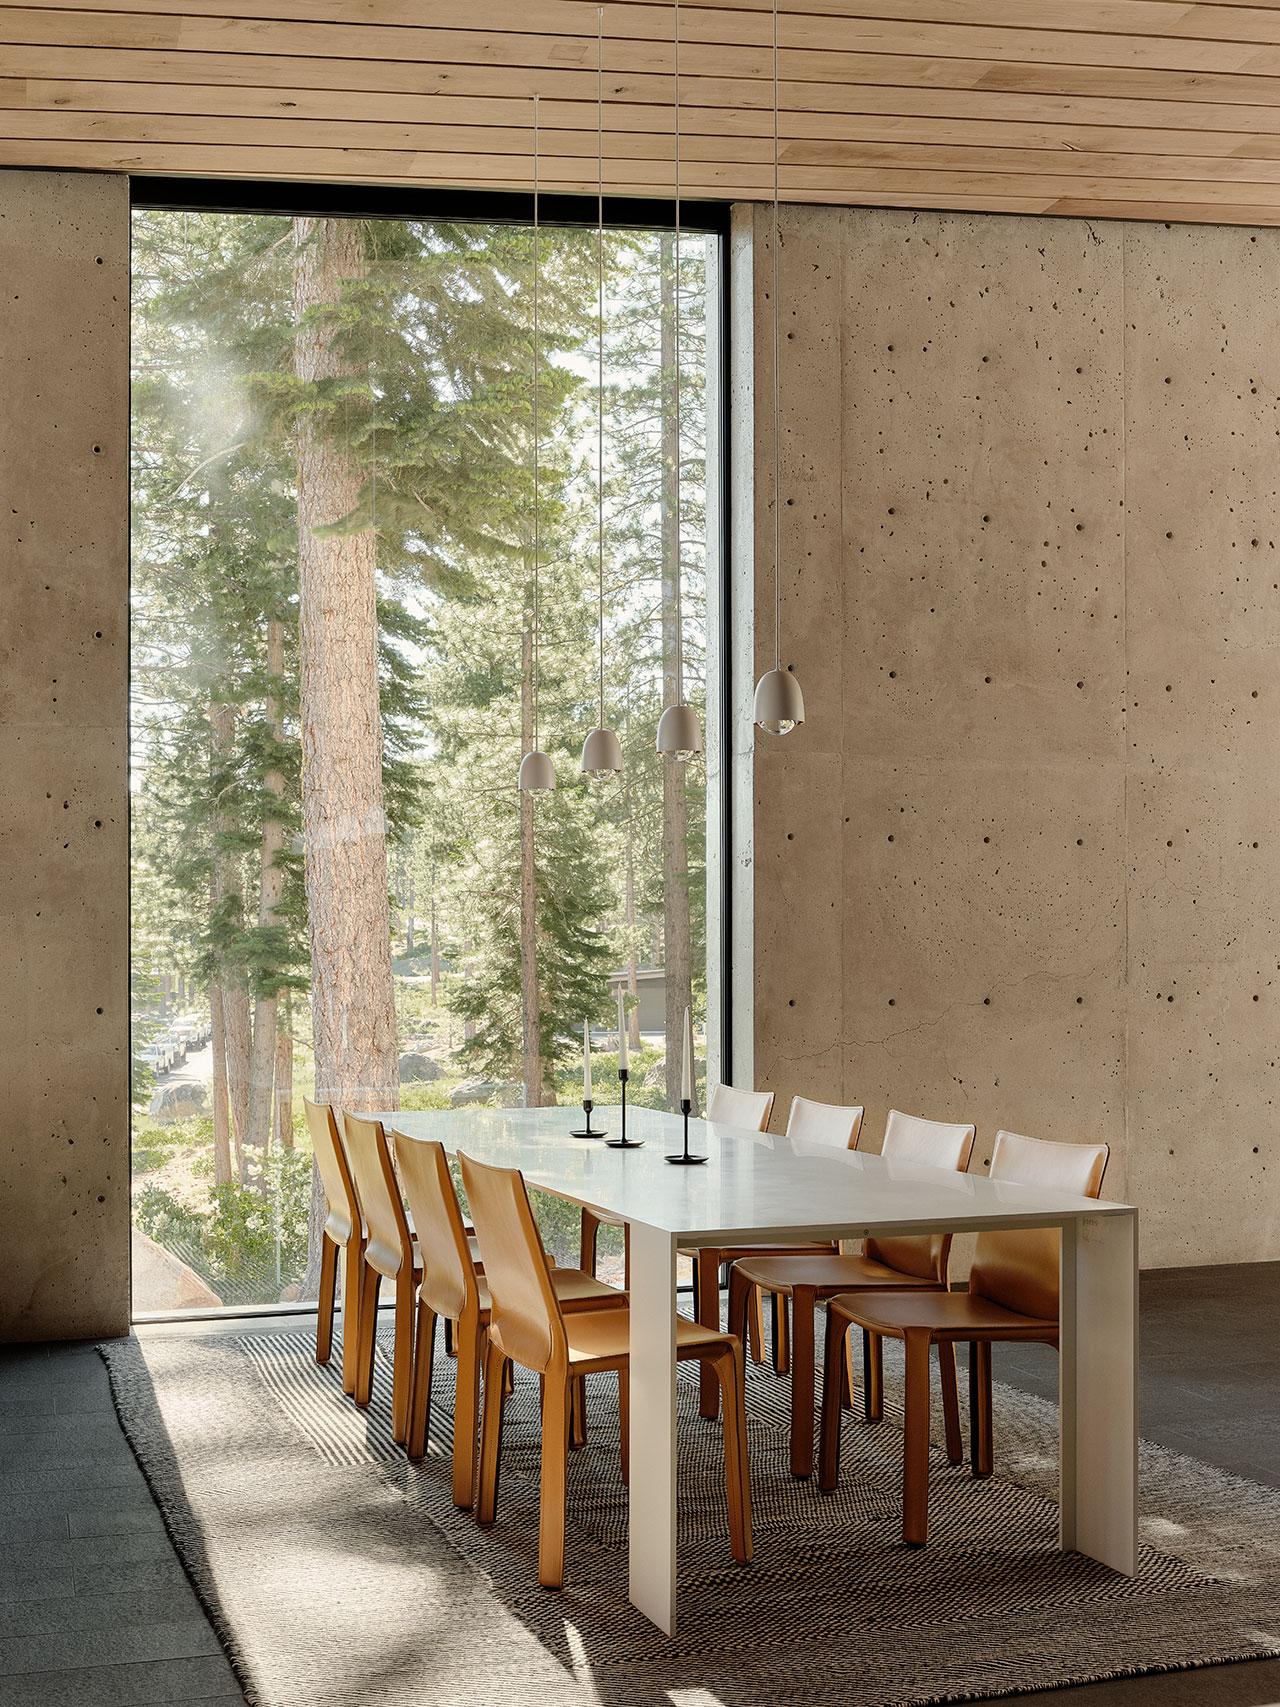 Lookout House byFaulkner Architects. Photography by Joe Fletcher Photography.